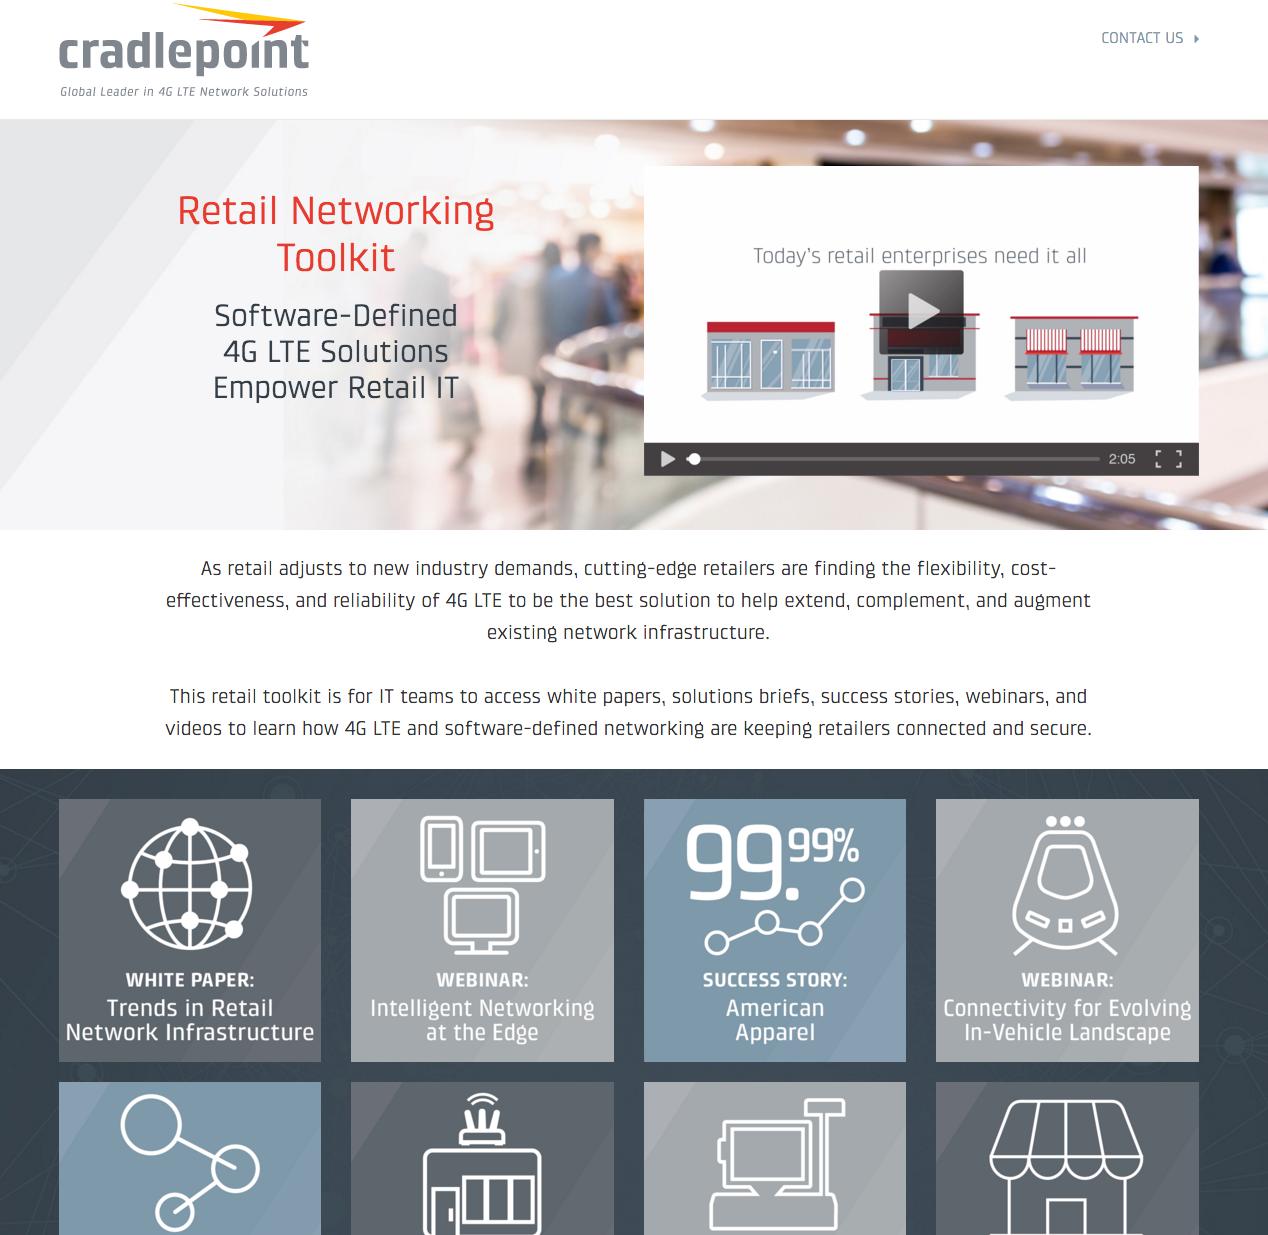 Cradlepoint_toolkit